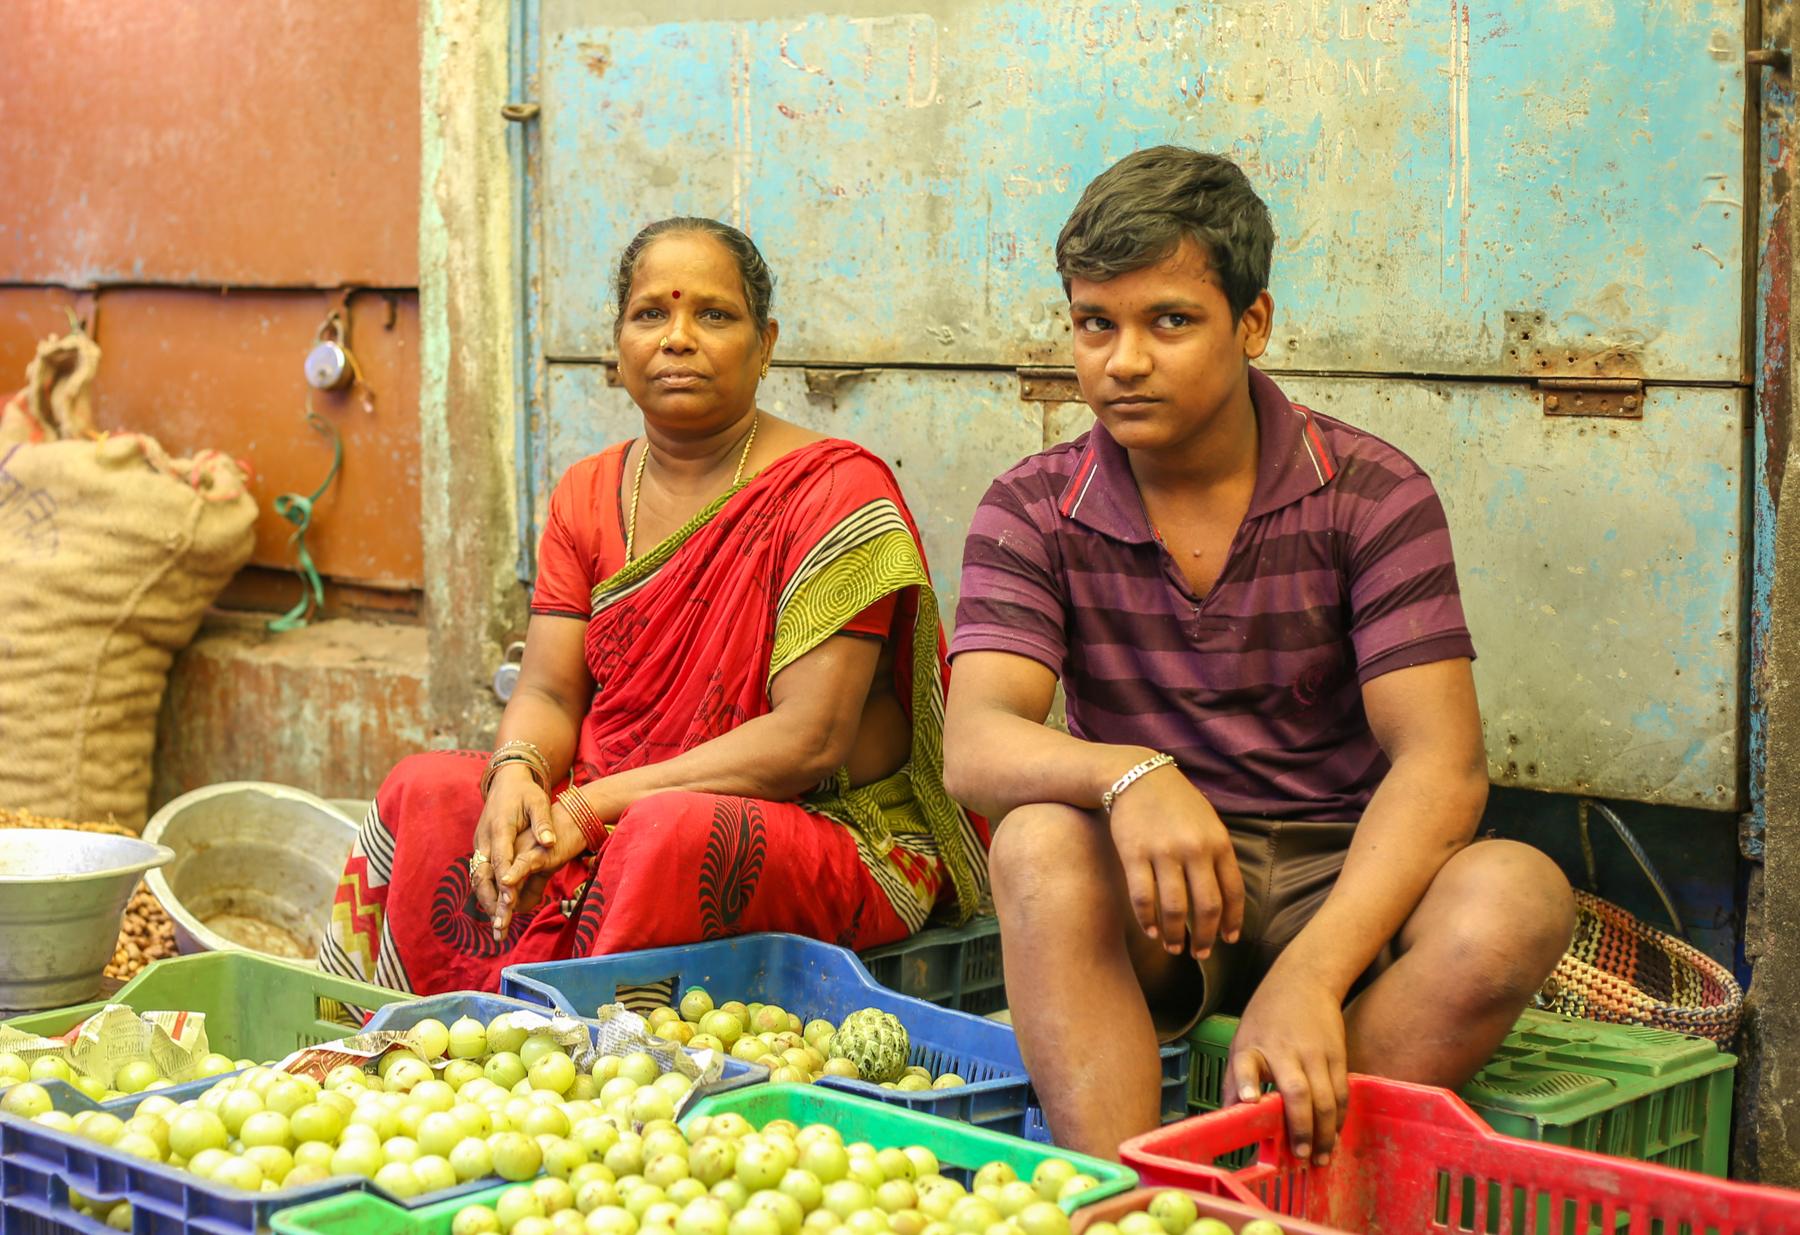 Inde-marché-reportage-pondichery-goubert-market